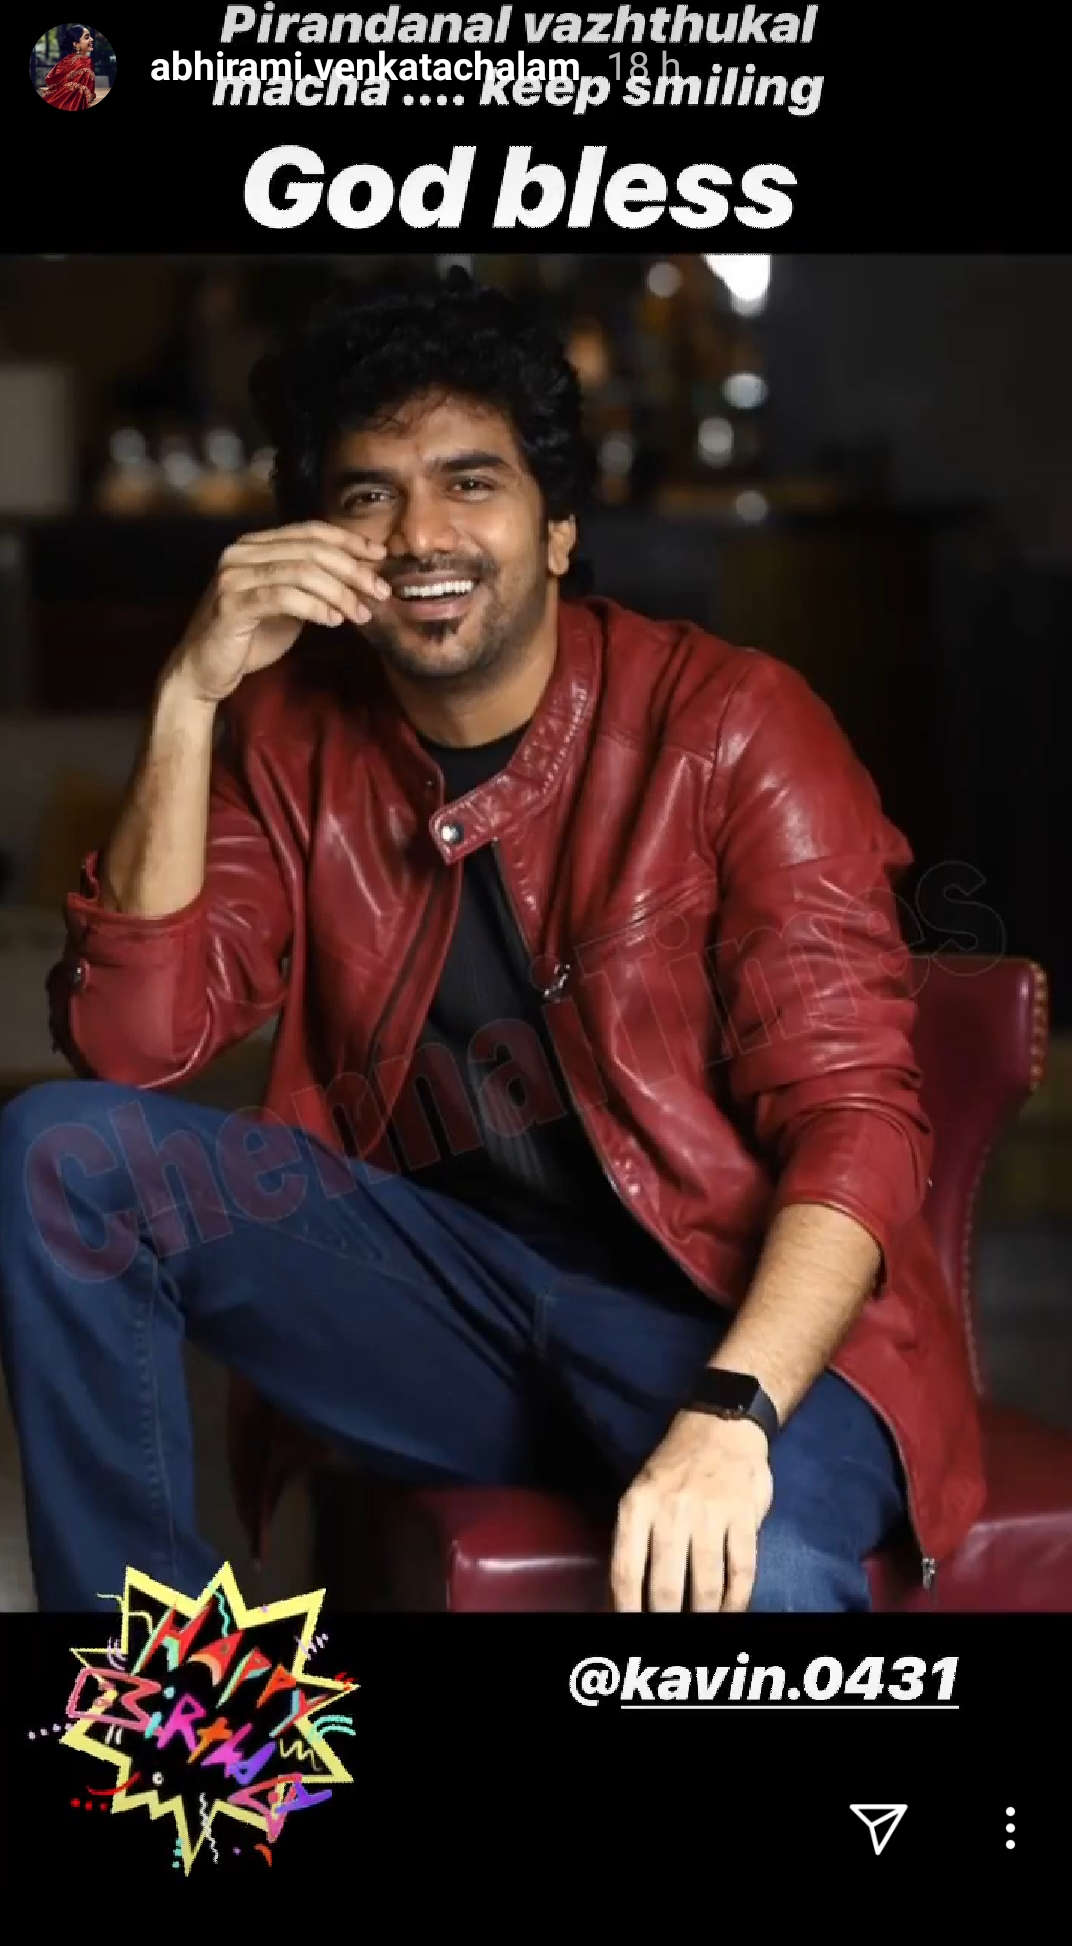 Abhirami Venkatachalam wishes Kavin on his Birthday